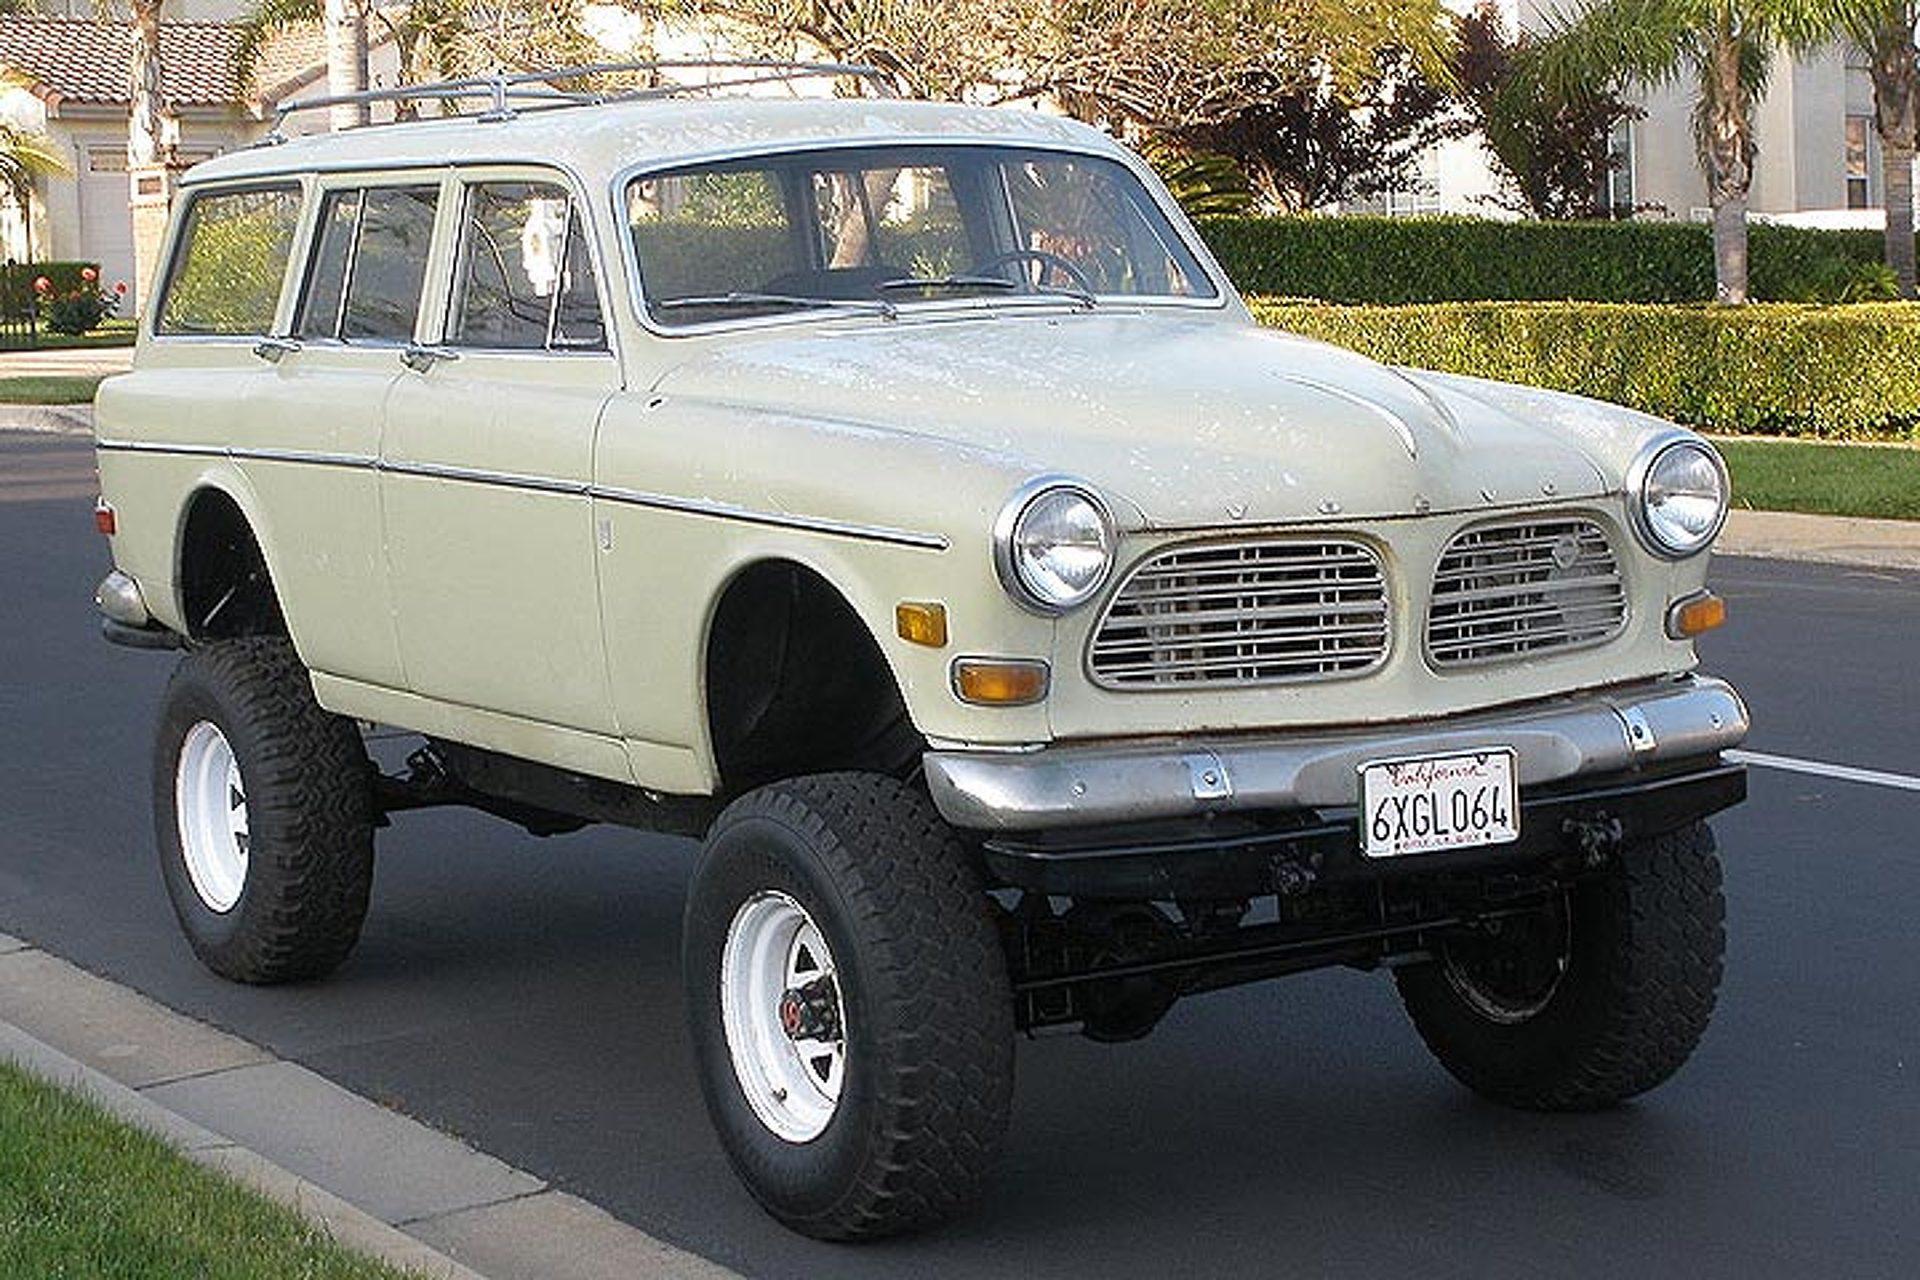 80s toyota trucks 4x4